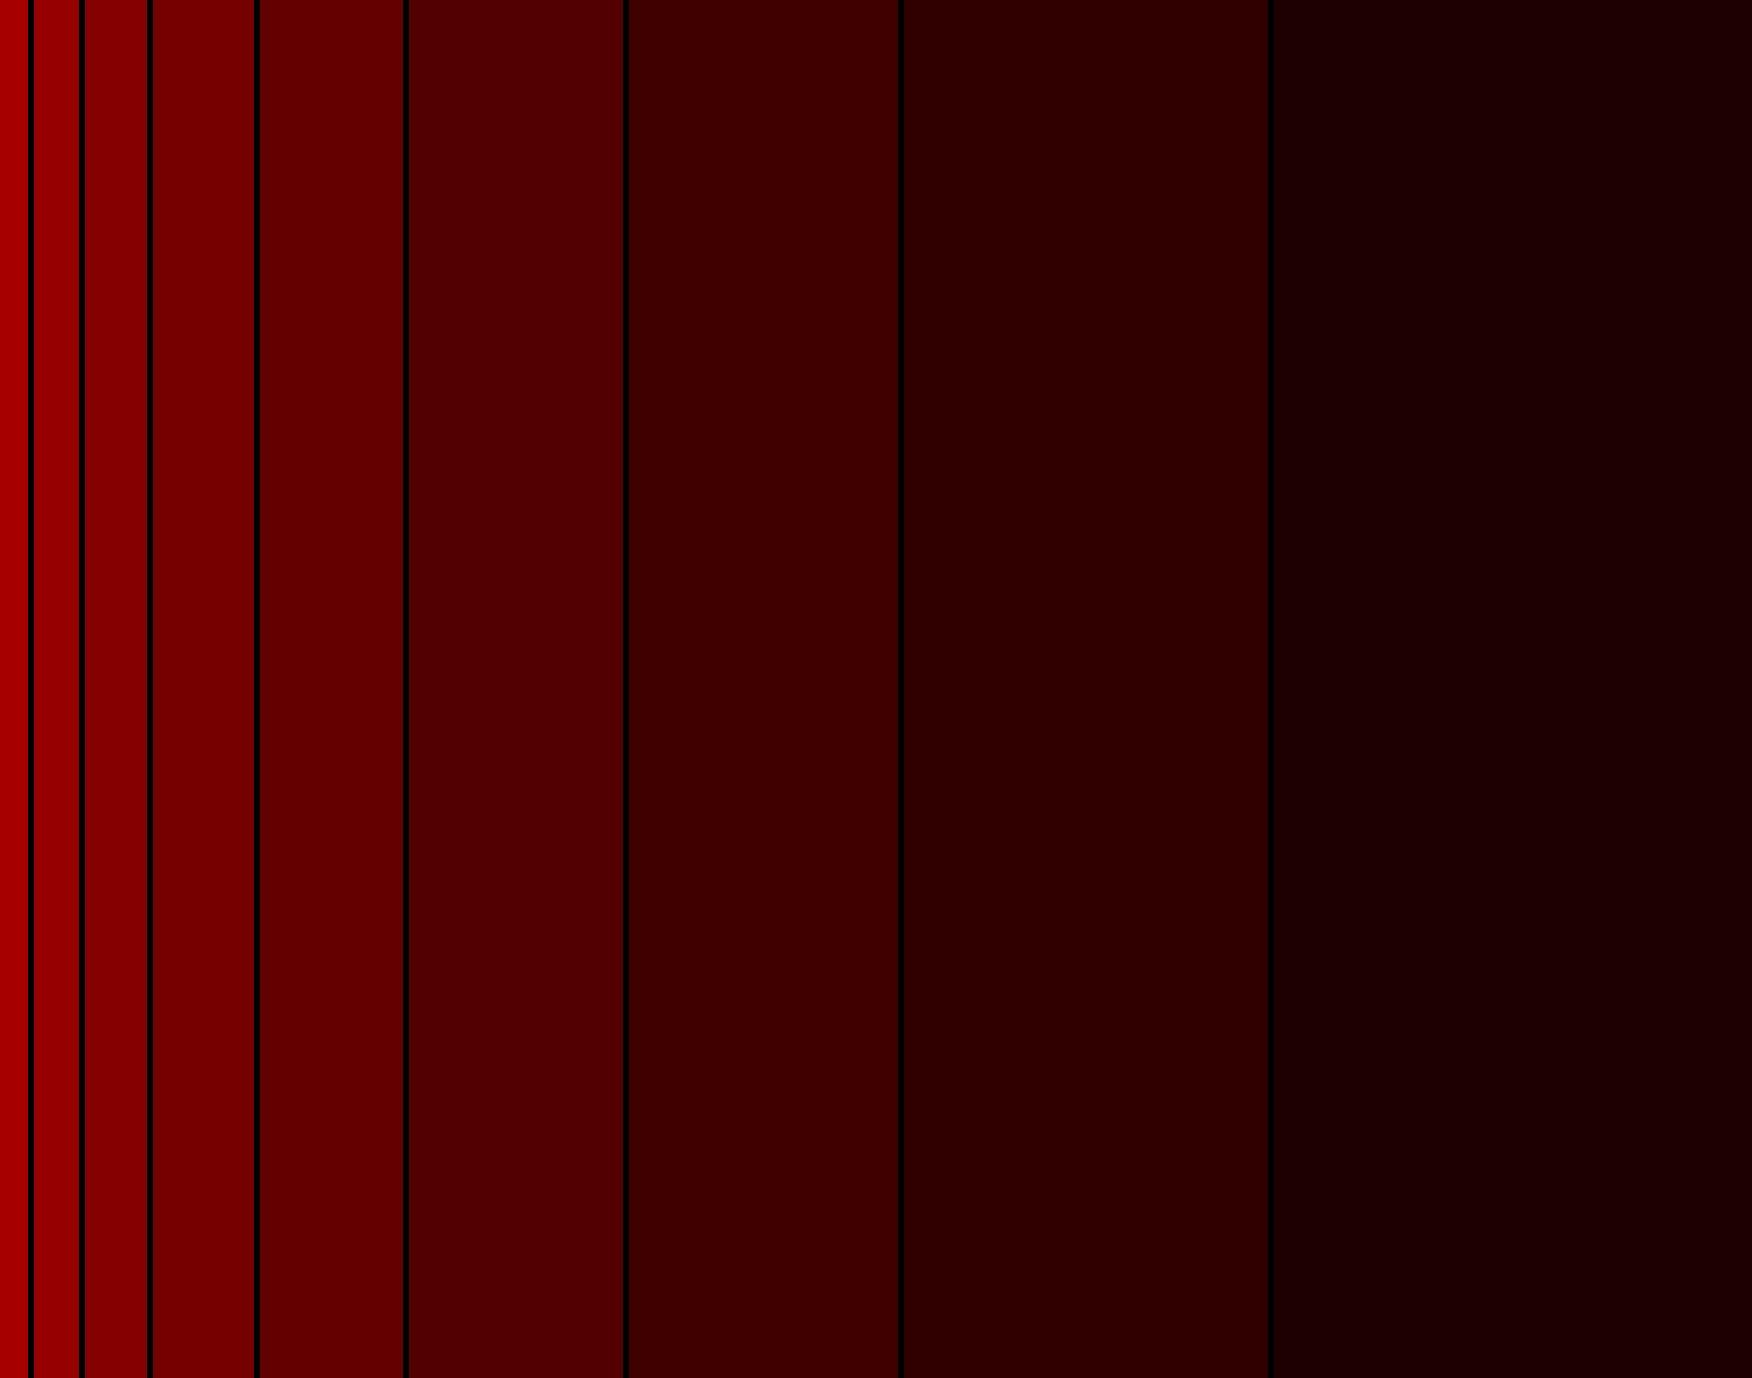 Maroon Backgrounds - WallpaperSafari